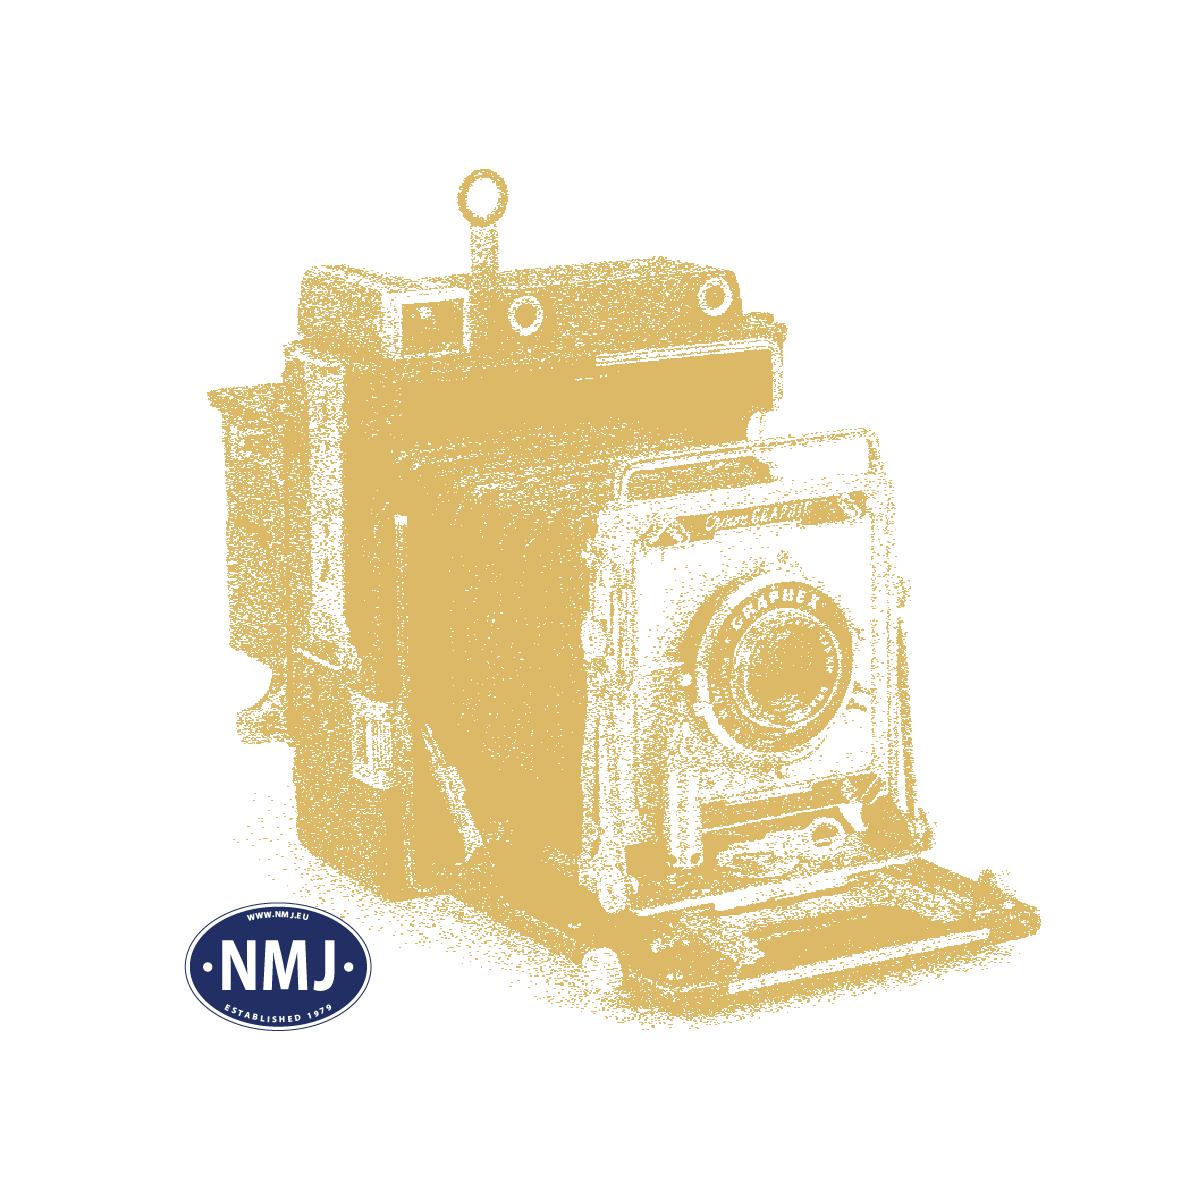 NMJSE2.904 - NMJ Superline SJ E2.904